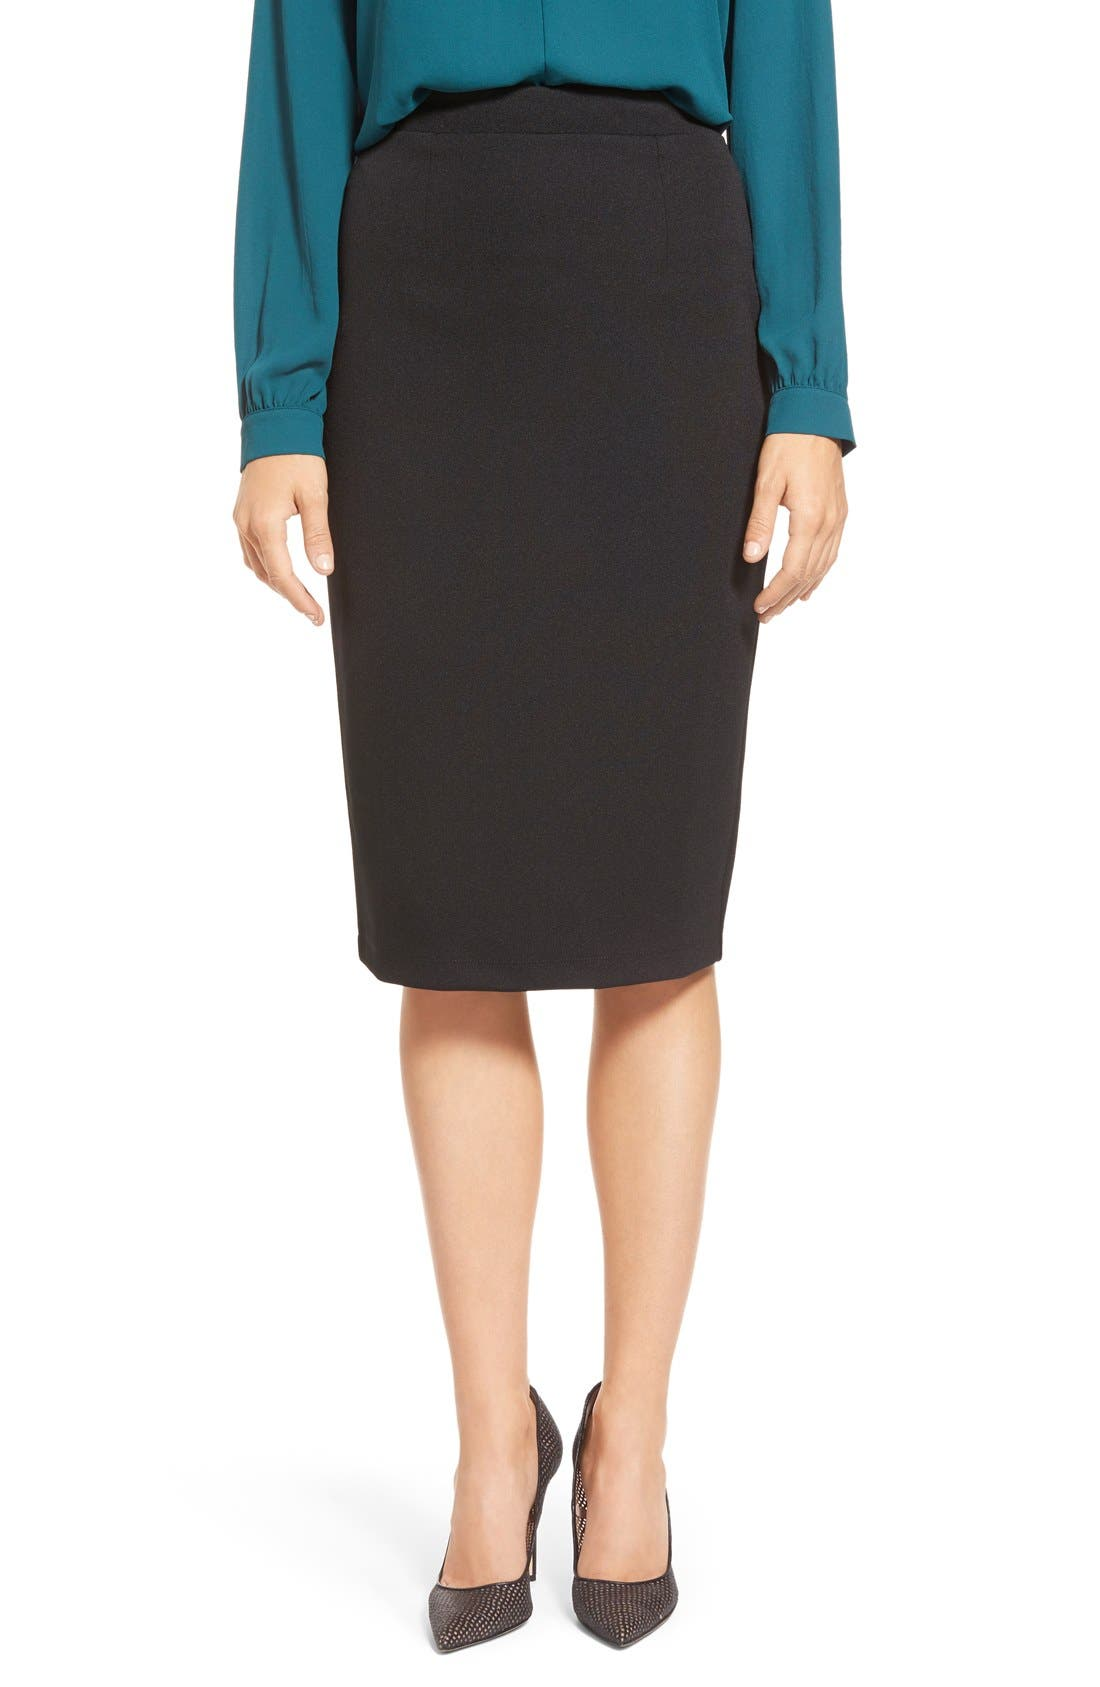 Alternate Image 1 Selected - Halogen® Zip Back Knit Pencil Skirt (Regular & Petite)